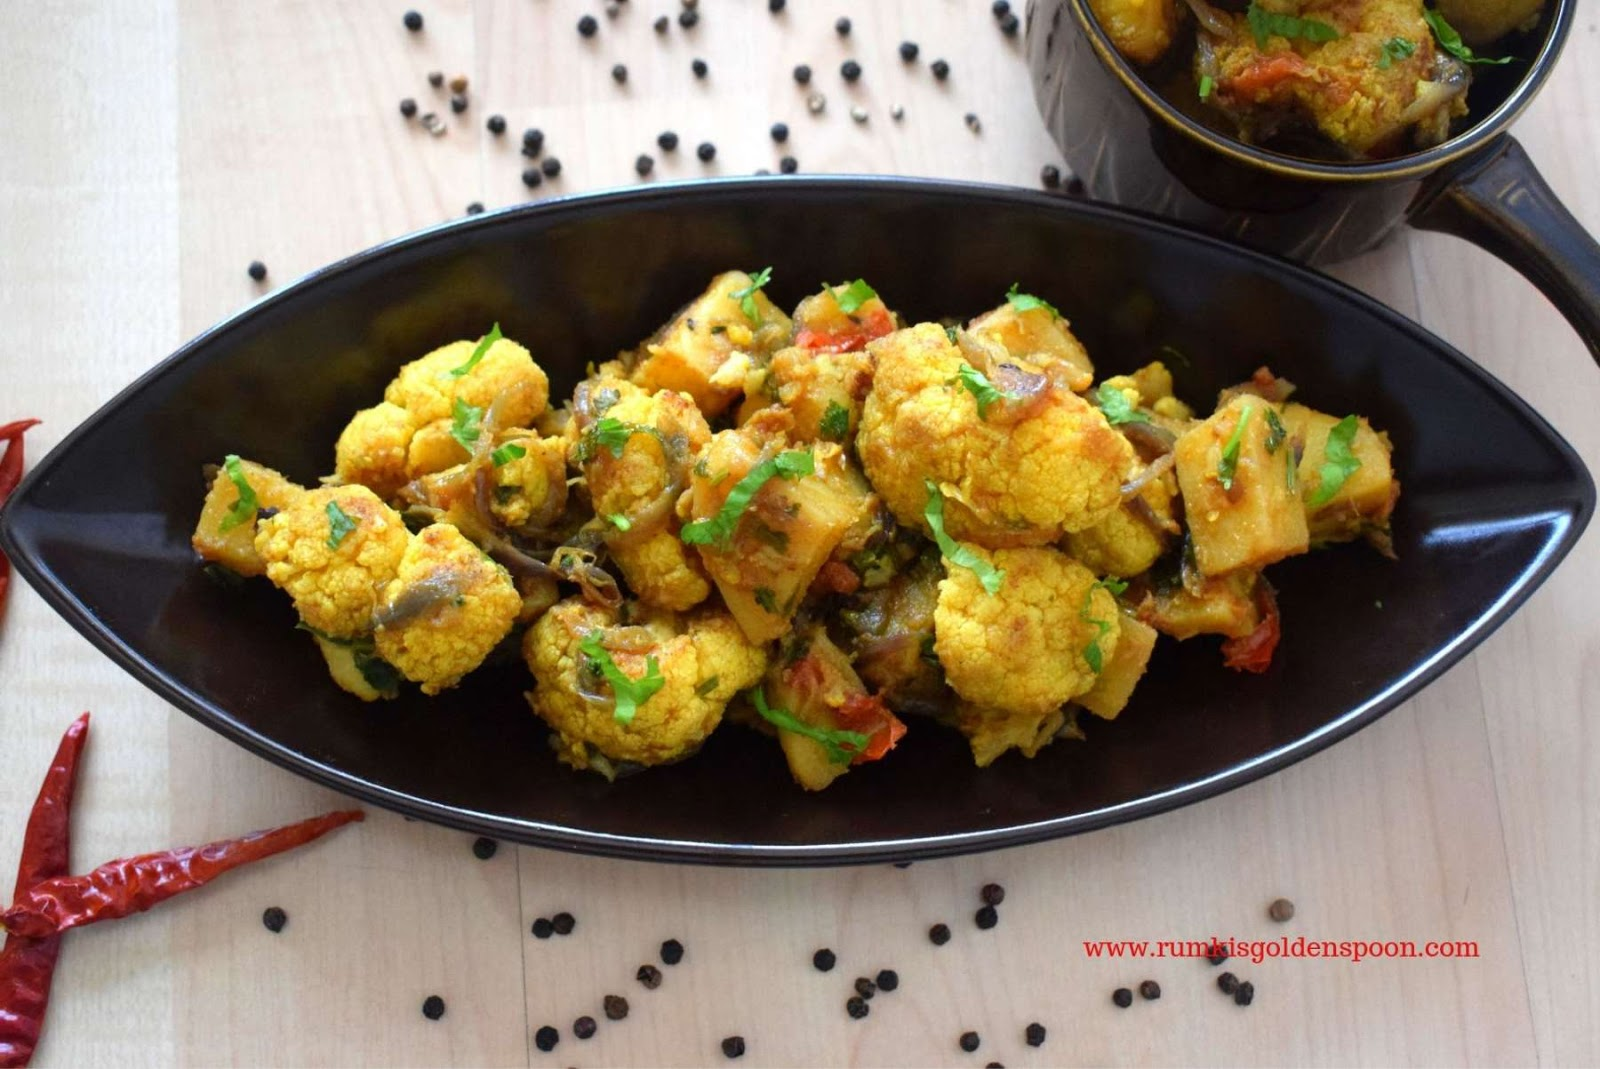 Aloo-Gobi masala, restaurant style Aloo-Gobi, dhaba style Aloo-Gobi, Aloo-Gobi ki sabji/tarkaari, Indian recipe with potatoes and cauliflower, Indian dry curry recipe with potato and cauliflower, aloo-phoolkofir torkari/ bhaja/ sobzi, vegan recipe with potato and cauliflower, Rumki's Golden Spoon